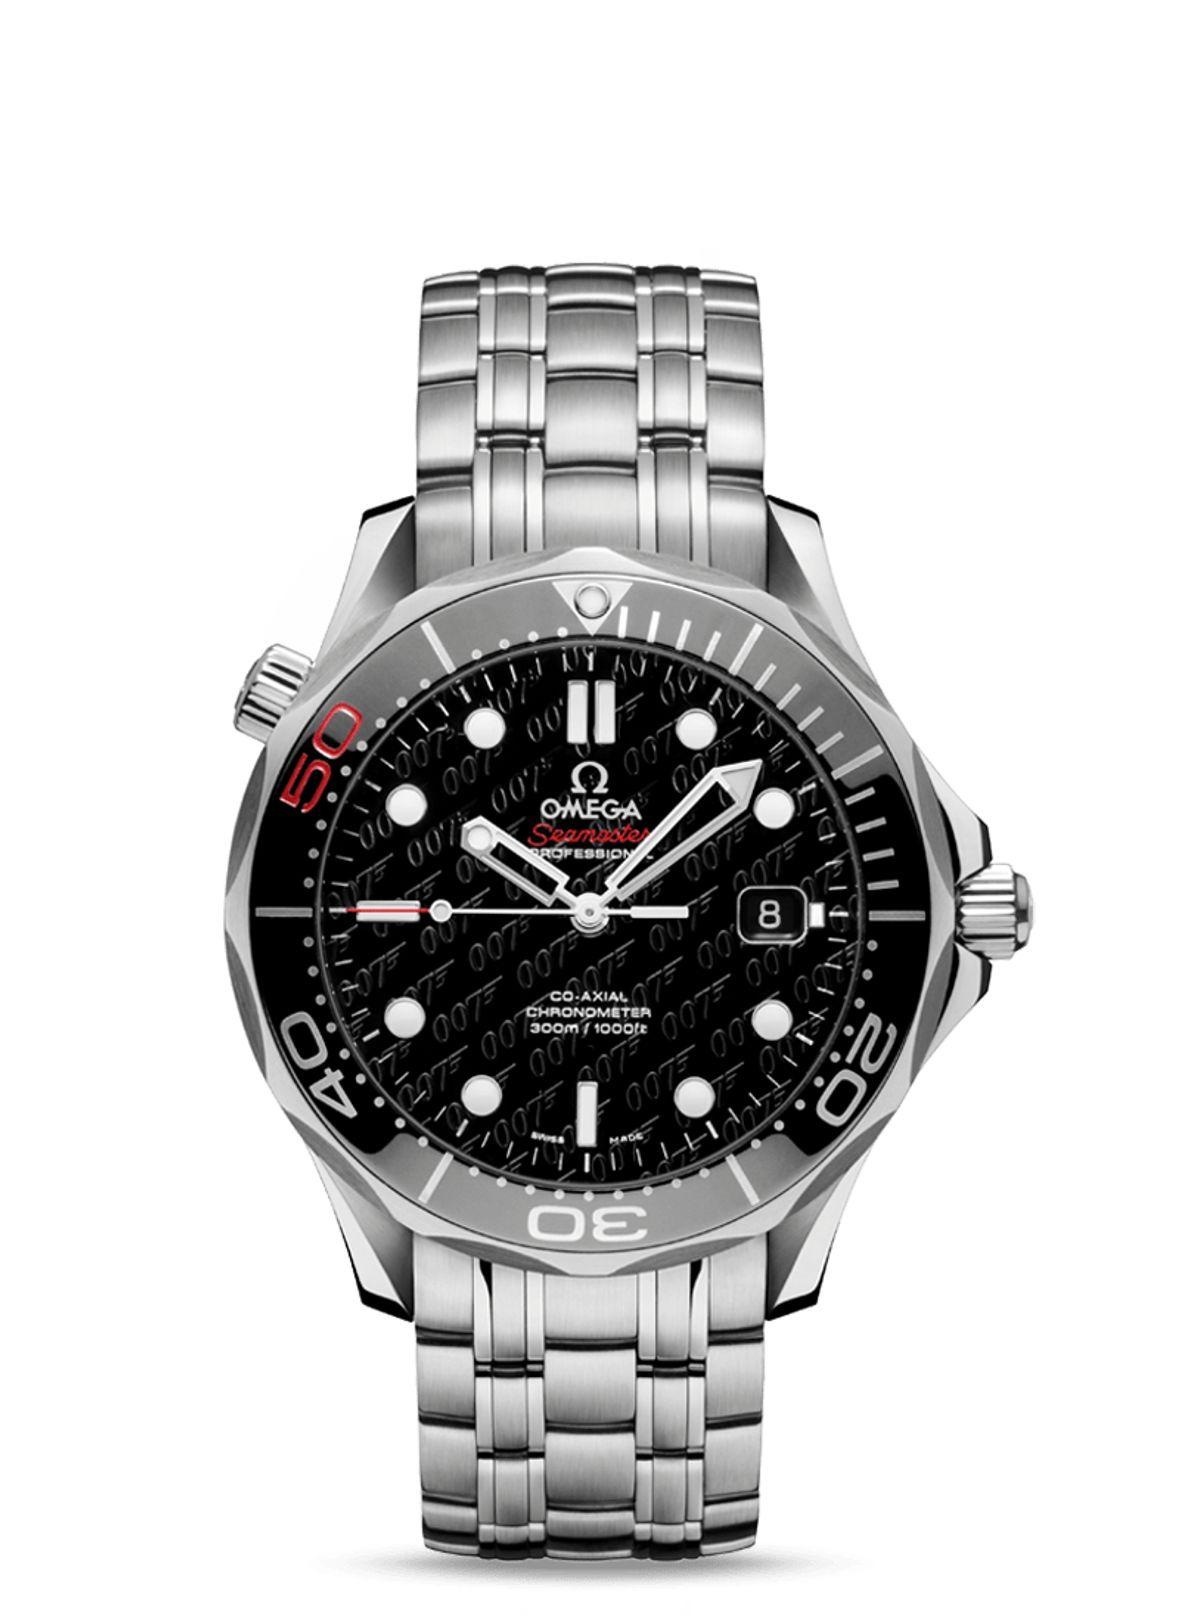 James Bond Omega Seamaster Diver 300M James Bond 50th Anniversary